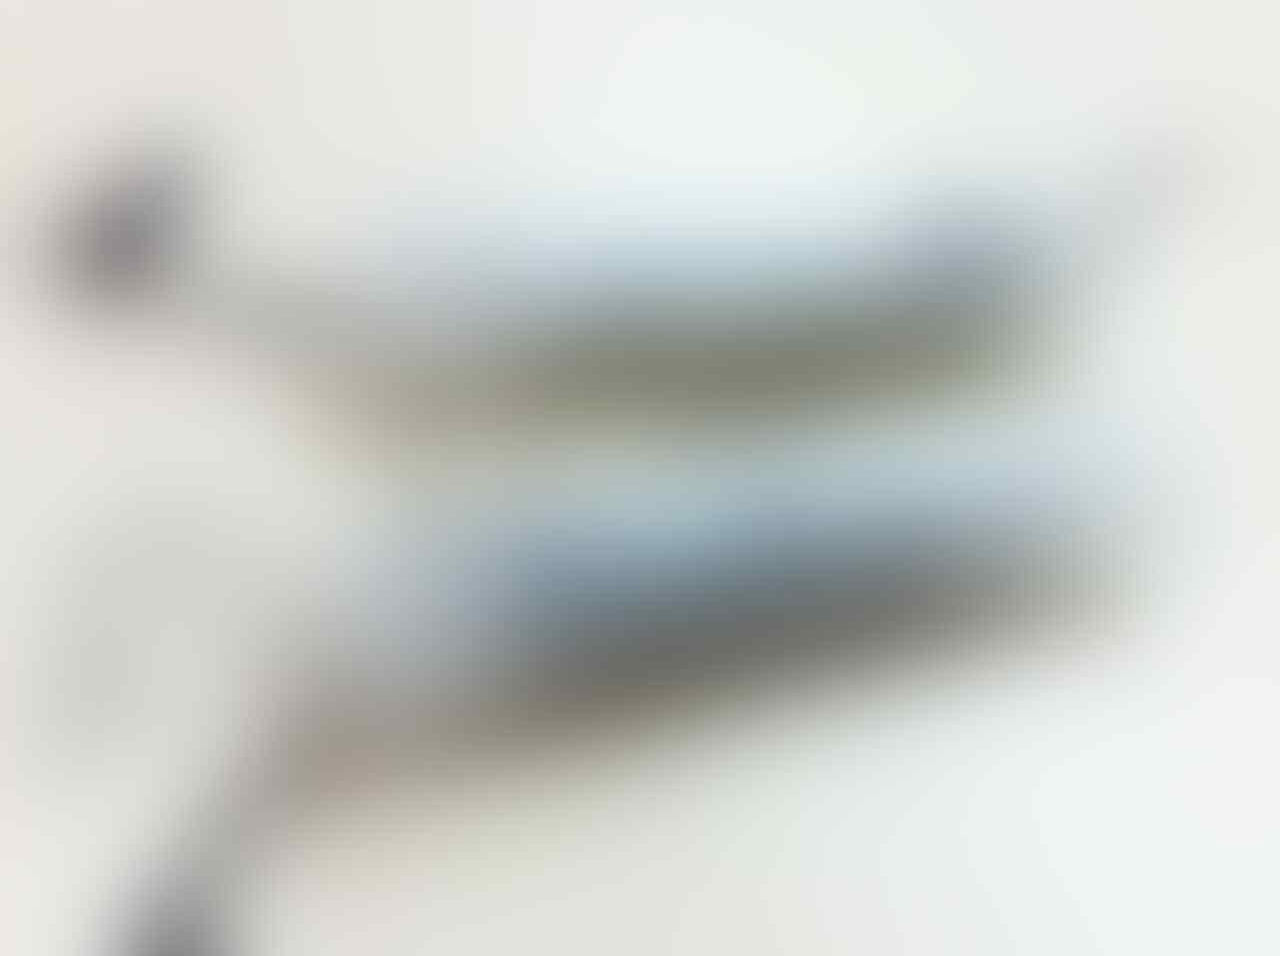 Aluminum Touch Screen Stylus Pen - RichCopter